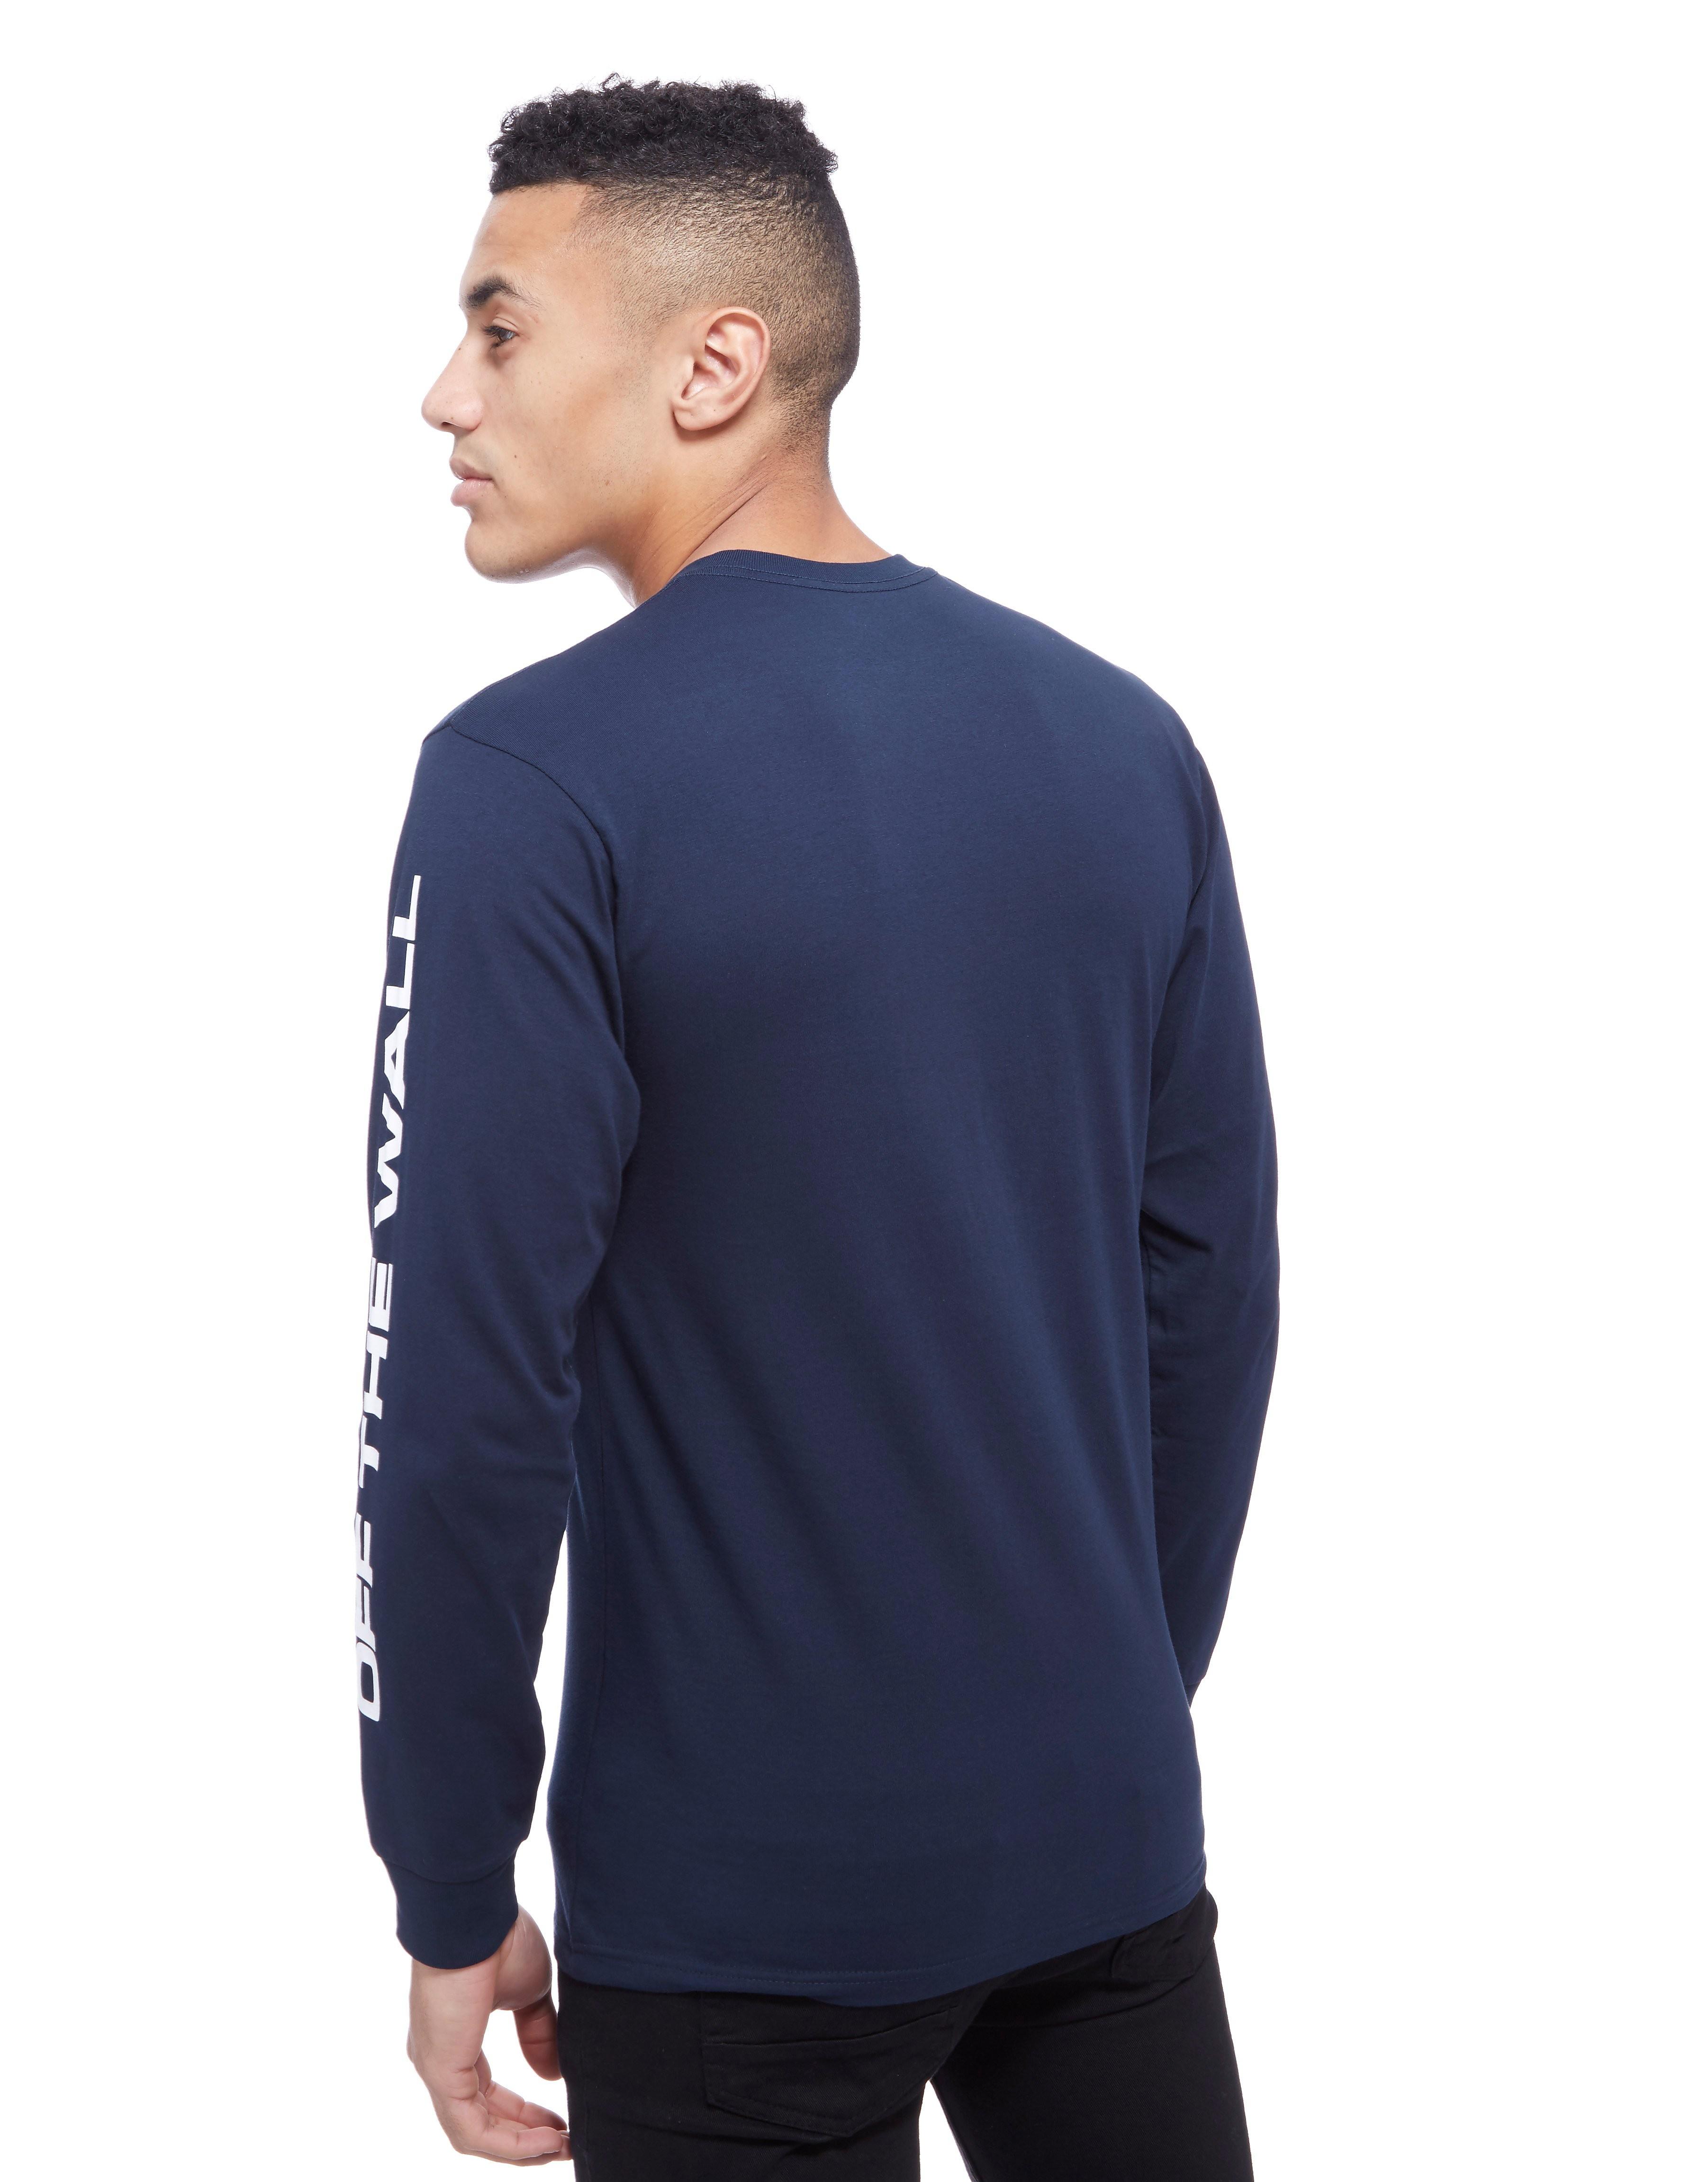 Vans Side Waze Long Sleeve T-Shirt